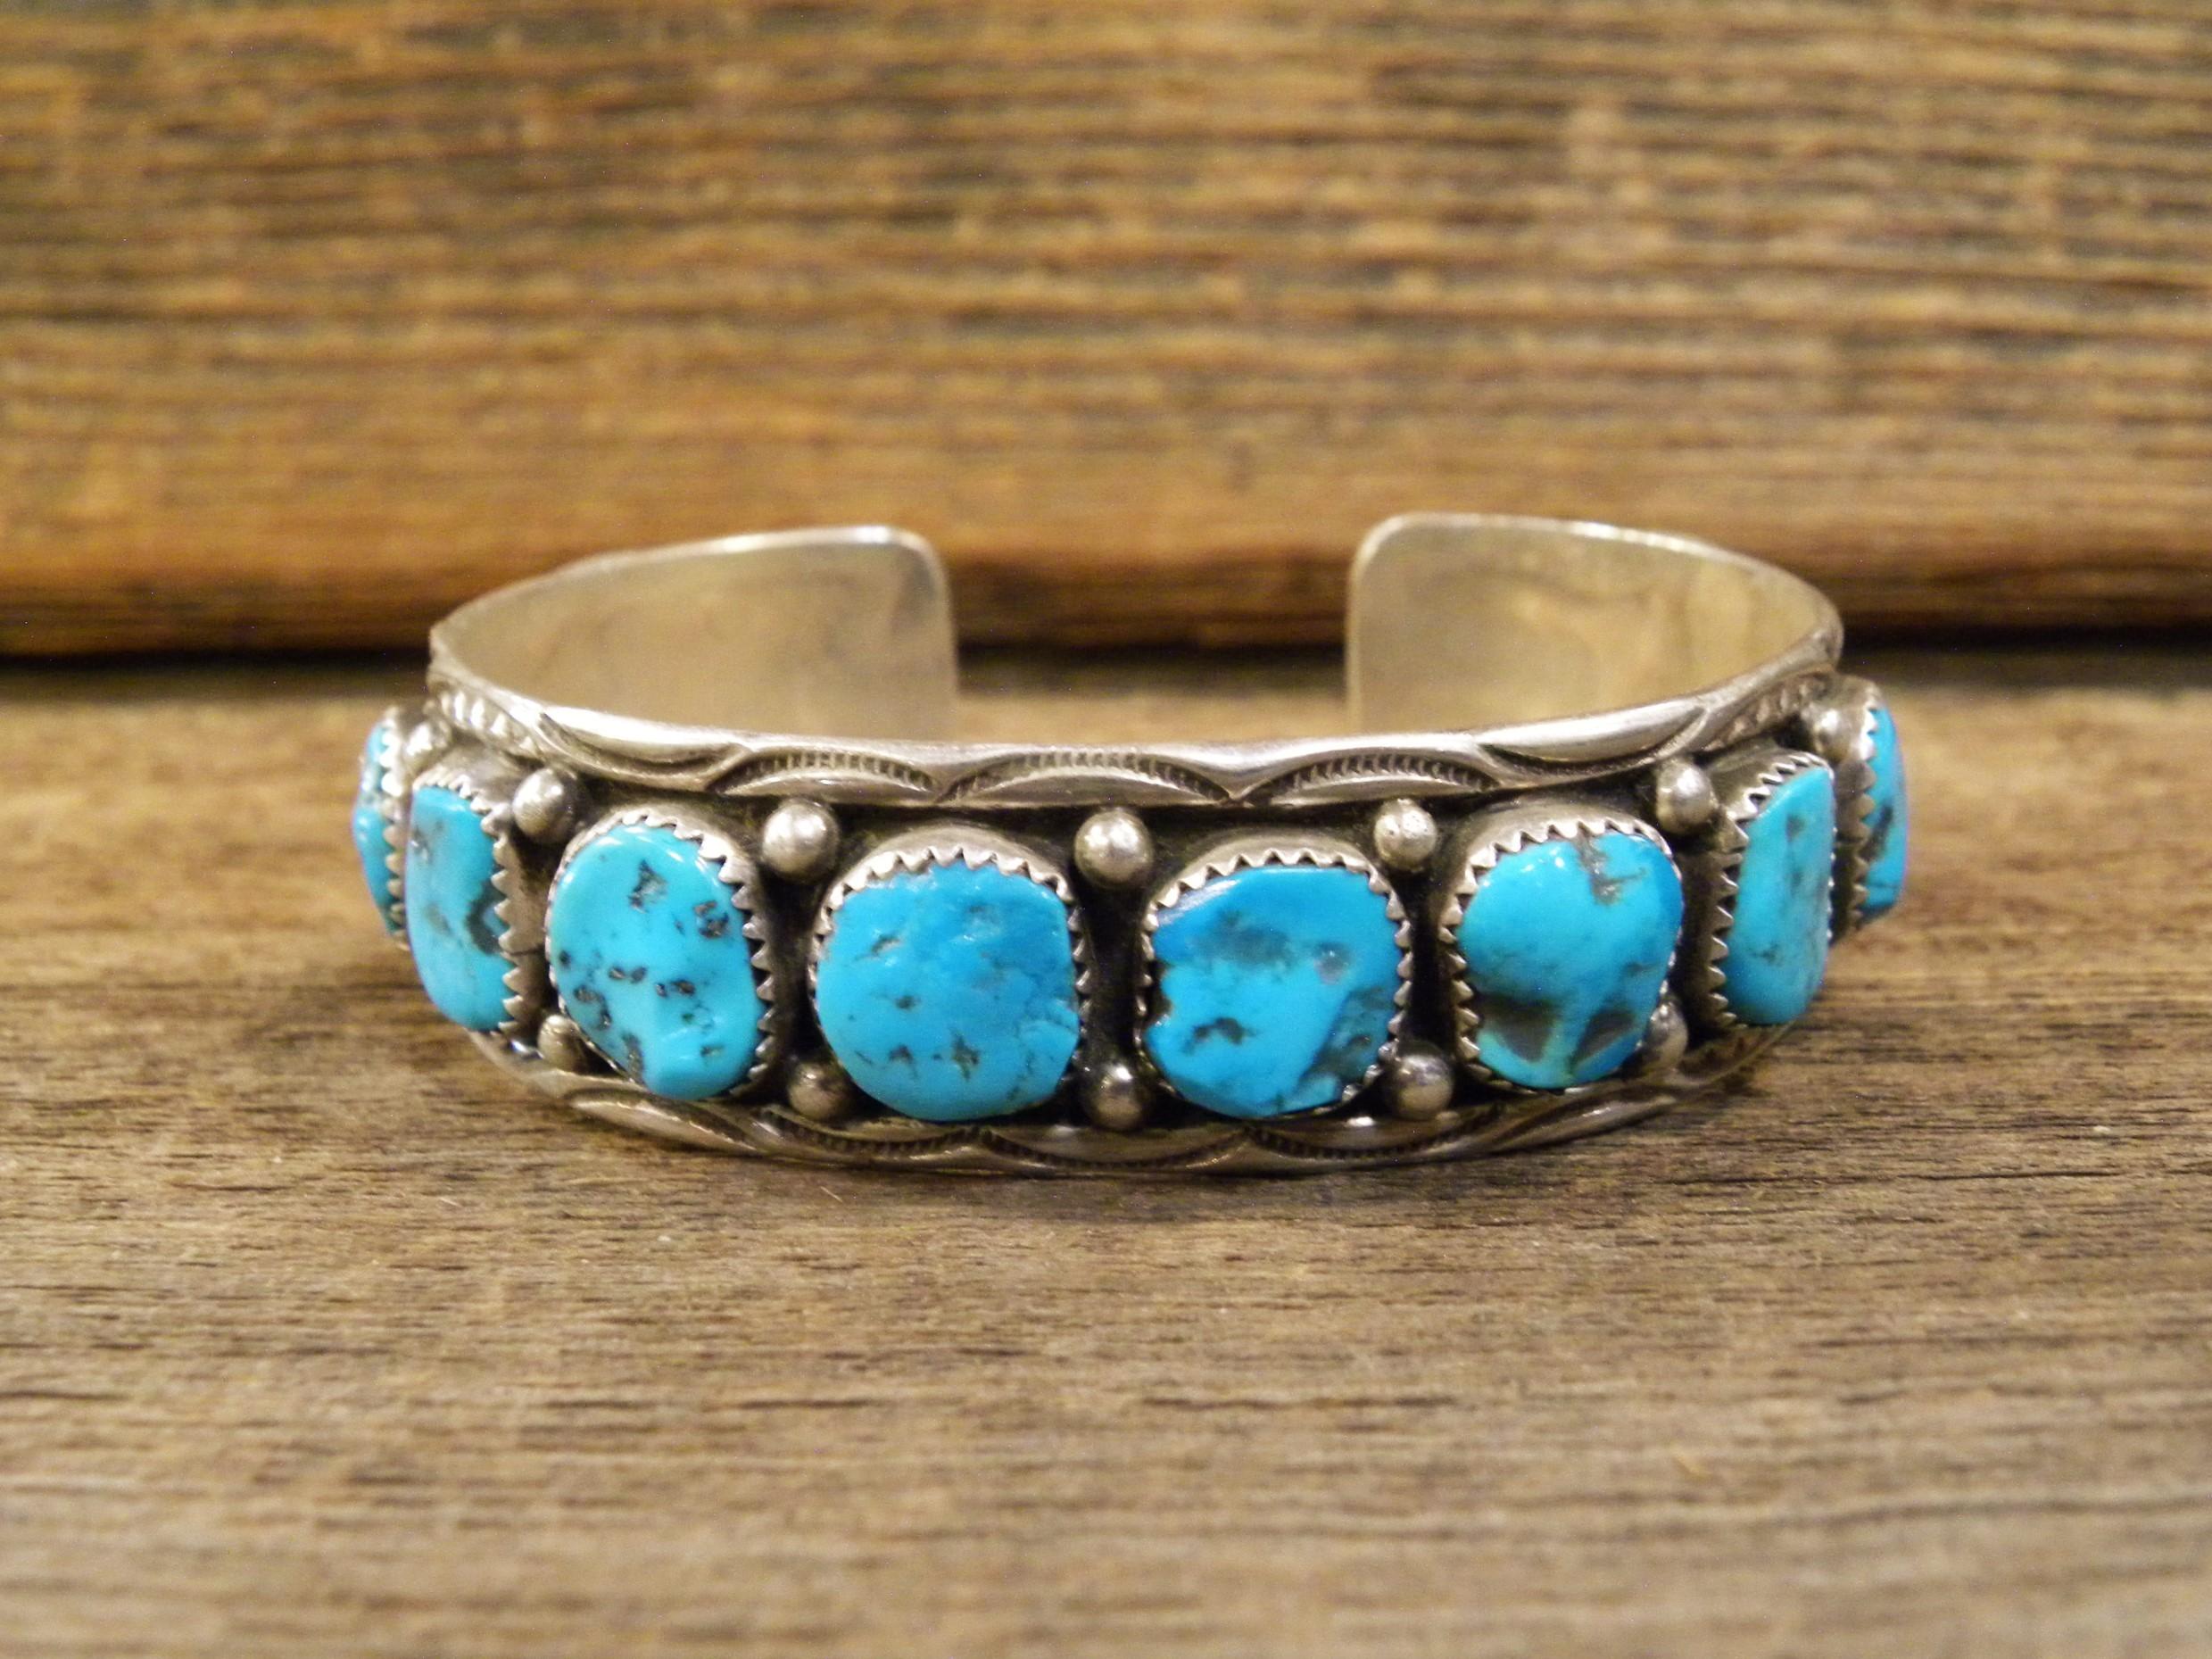 PB96 Pawn Navajo Sleeping Beauty Turquoise Bracelet